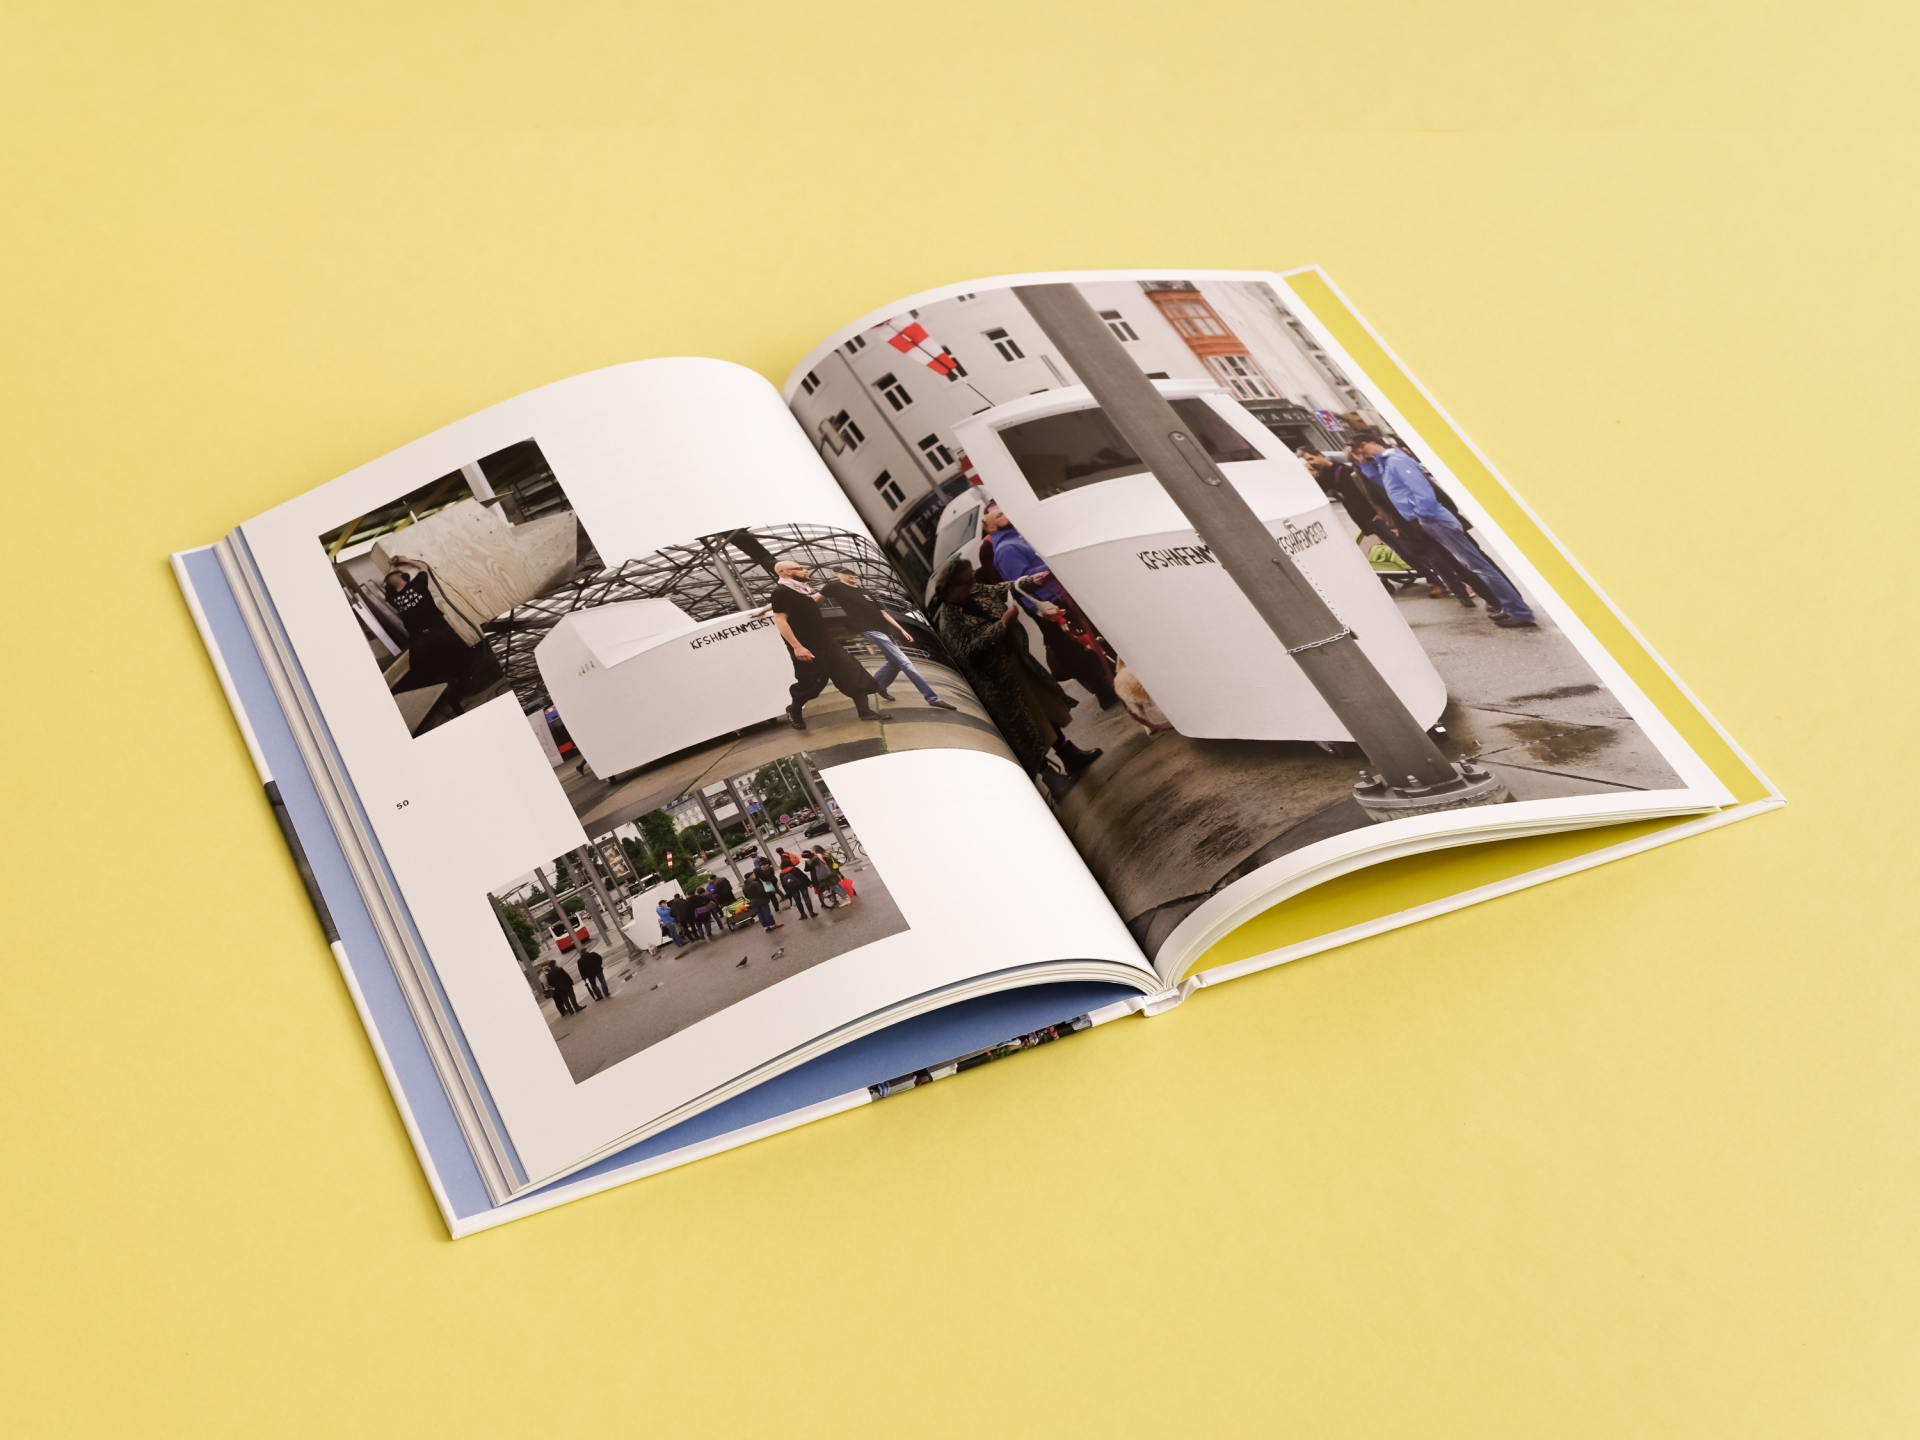 Grafikum Prater Stern Stunden catalogue